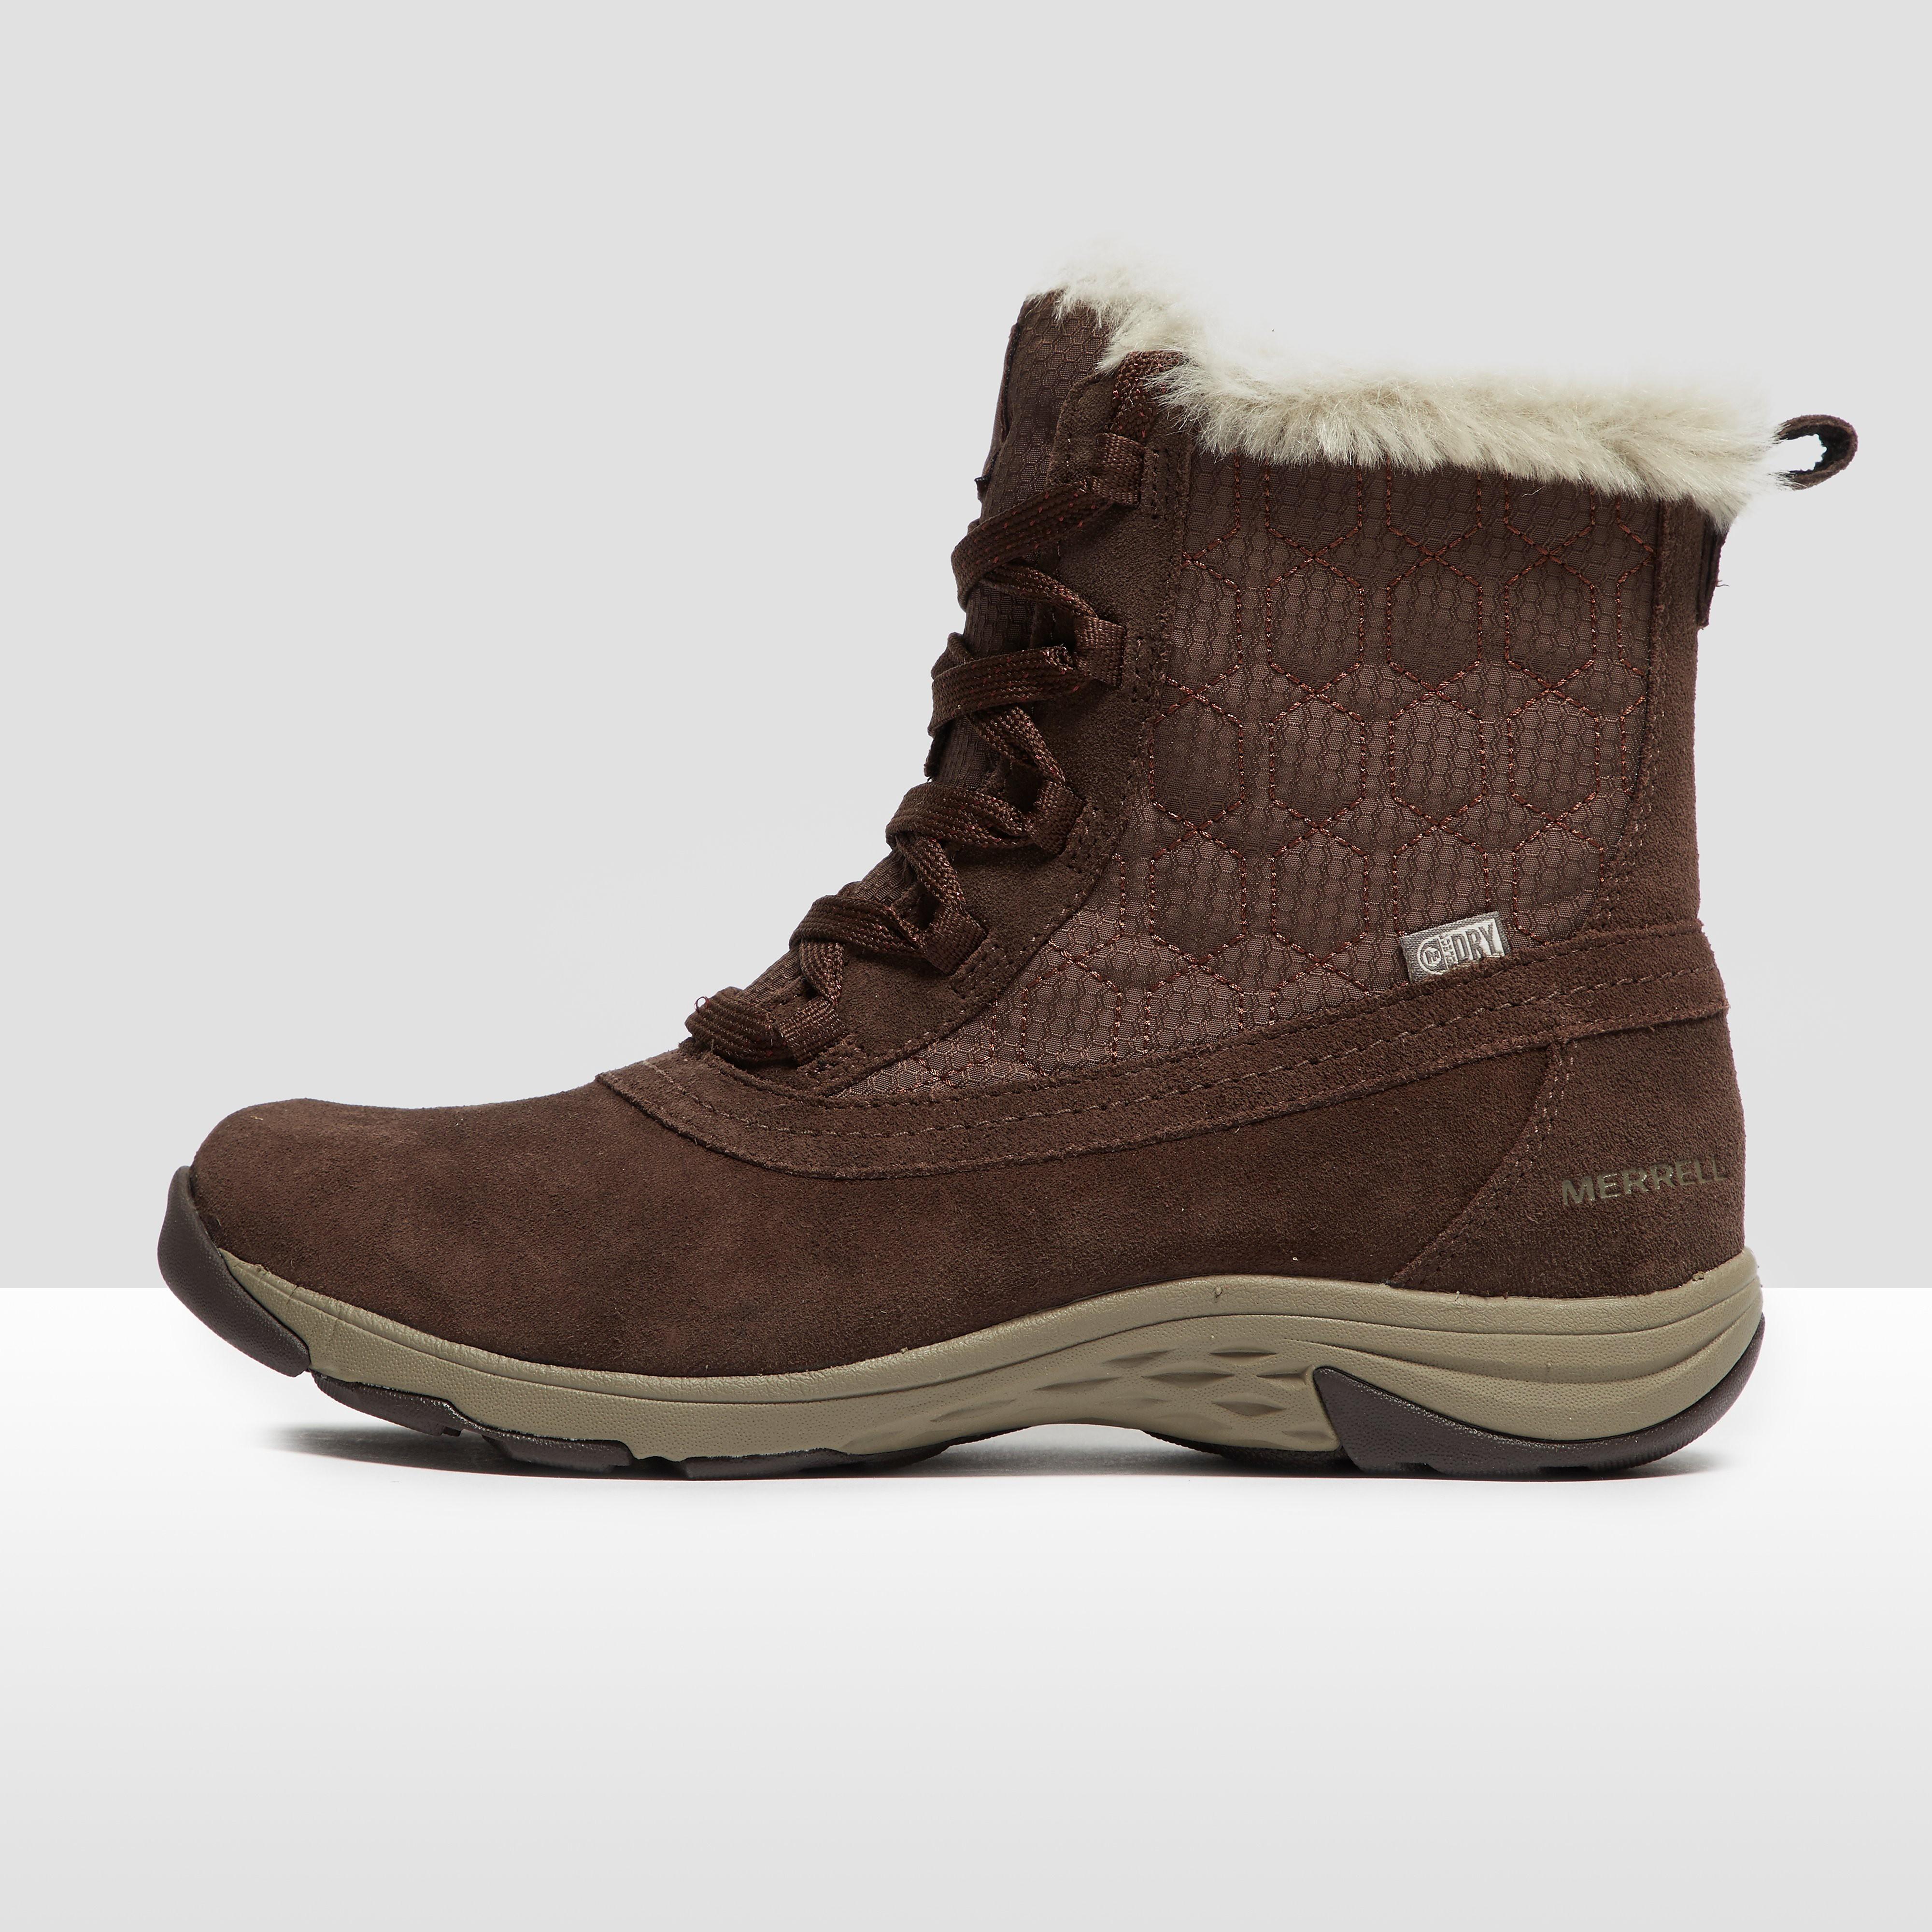 Merrell SNOWBOUND MID WATERPROOF Women's Boots